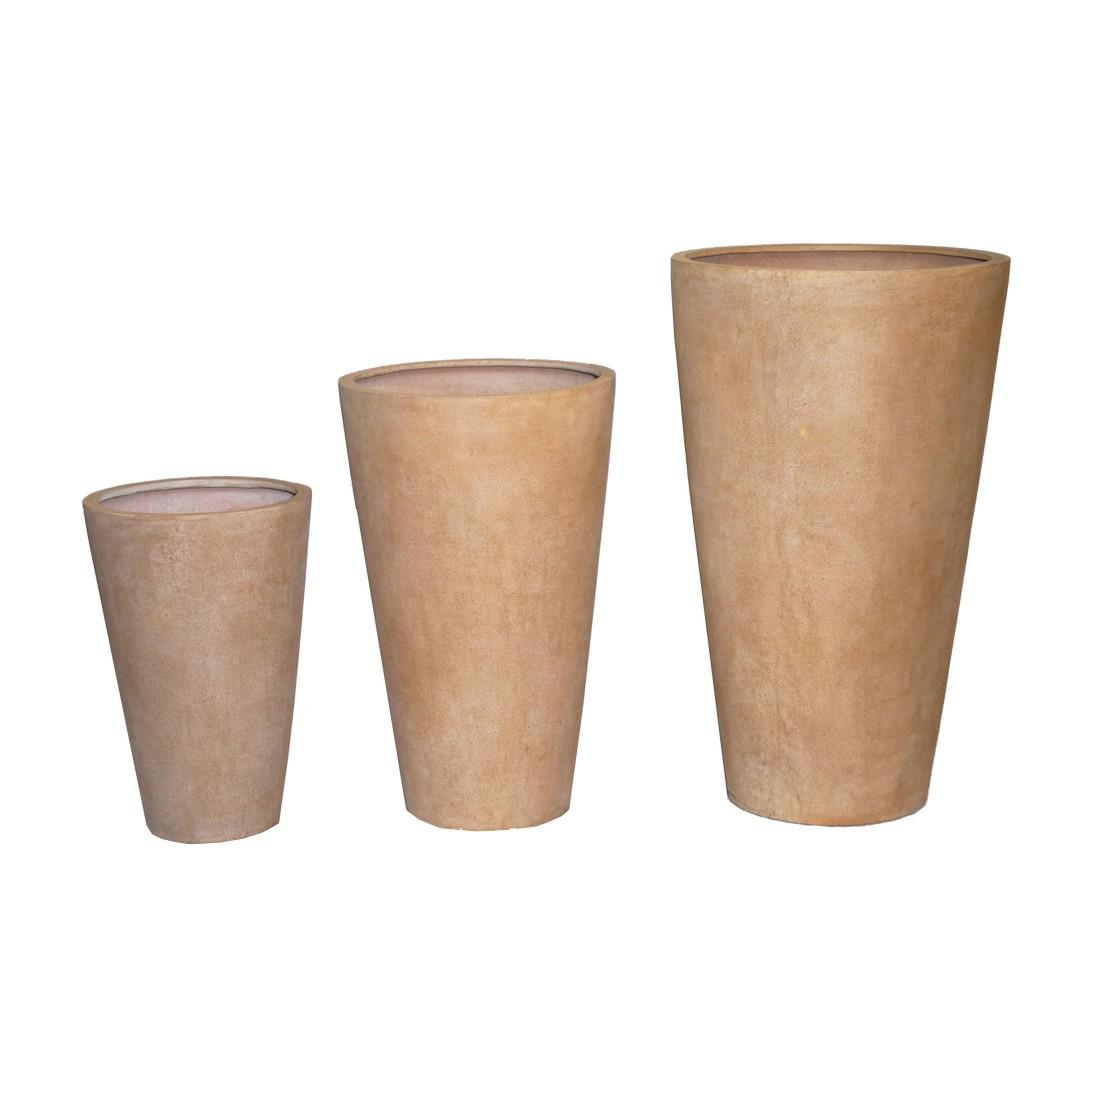 Pflanzkübel ISI Cotto – Kunststoff – Terracota – Classic Rund – Normal – 3er-Set, Viducci's Garden bestellen